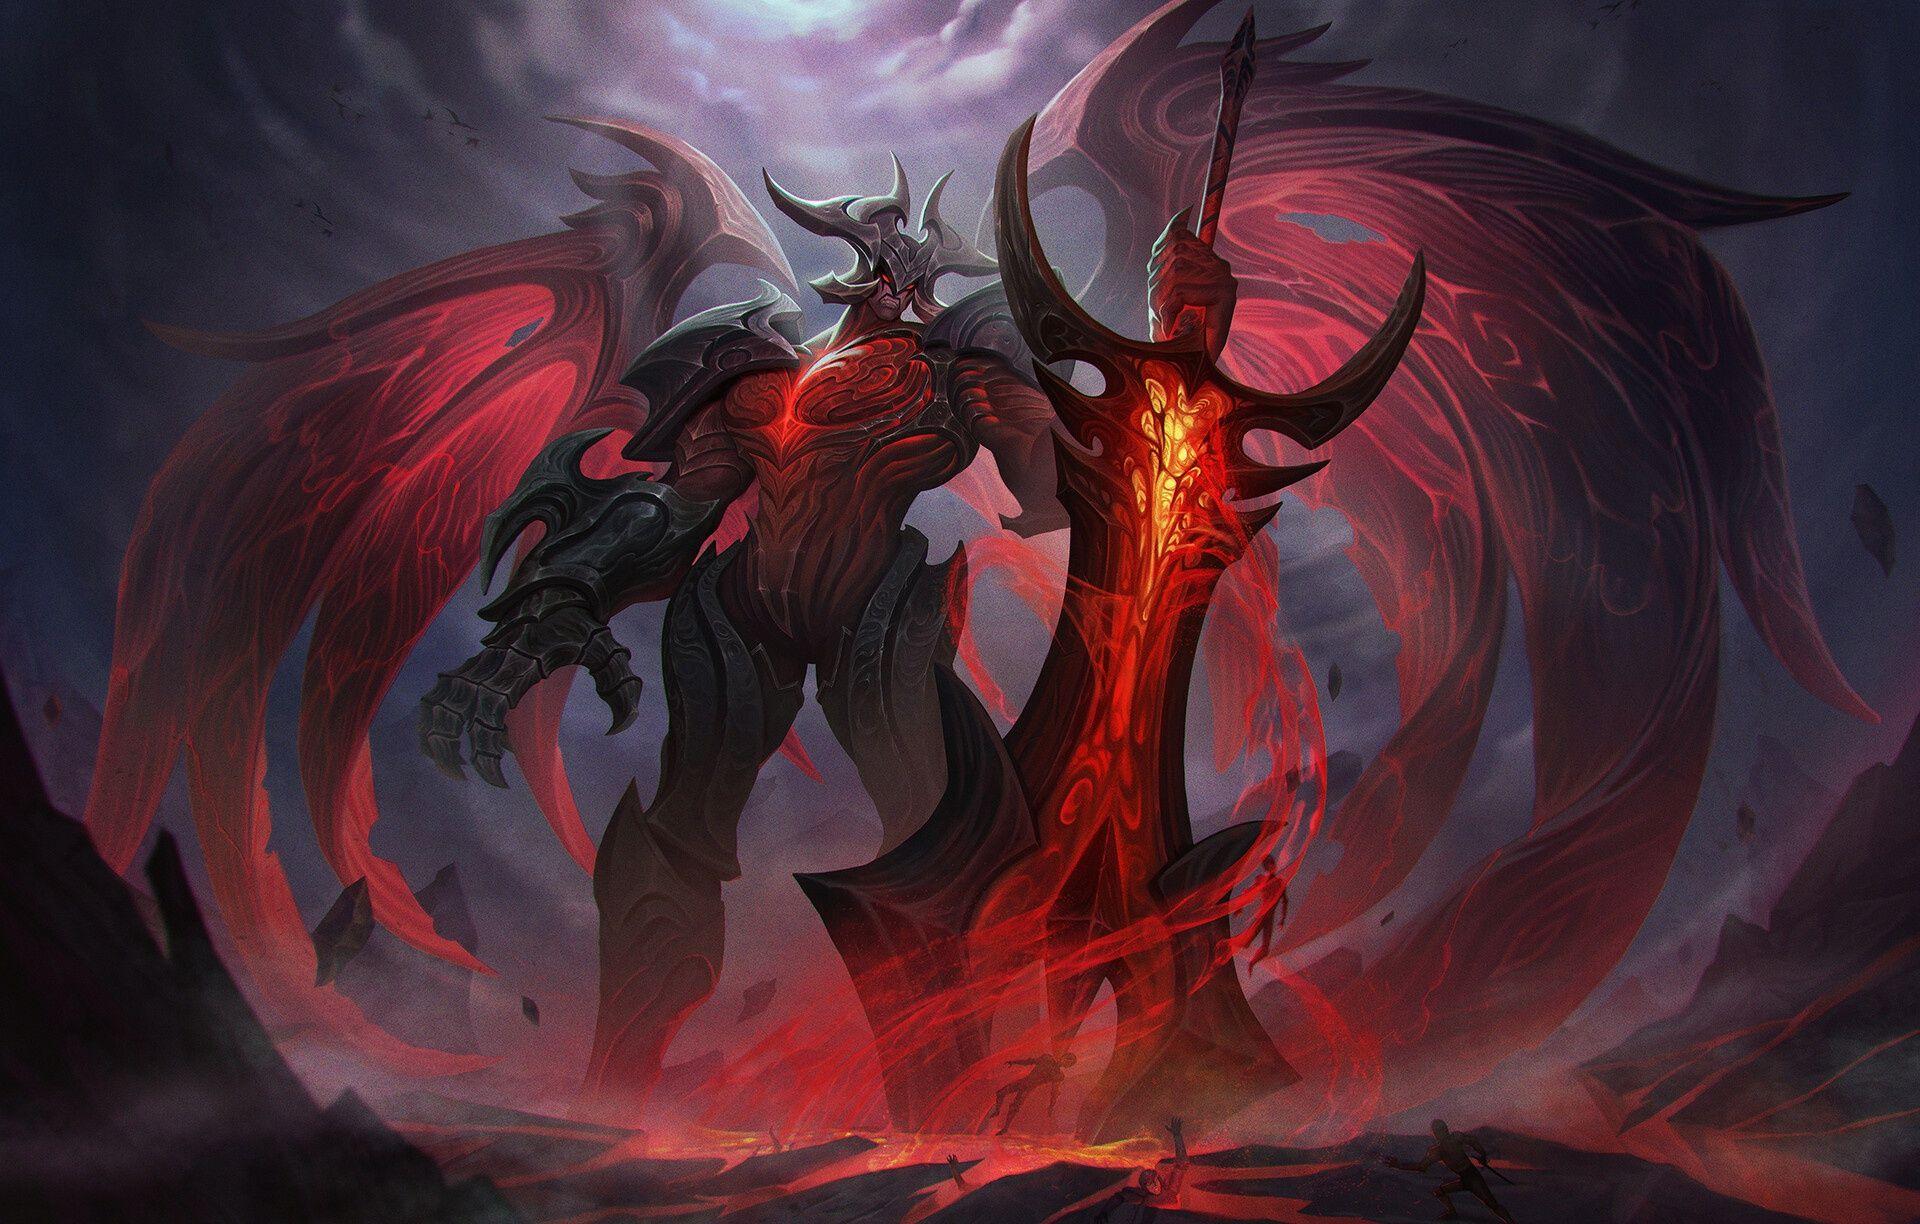 Video Game League Of Legends Sword Demon Aatrox HD Wallpaper Background  Image in 2020 | Wallpaper backgrounds, Lol league of legends